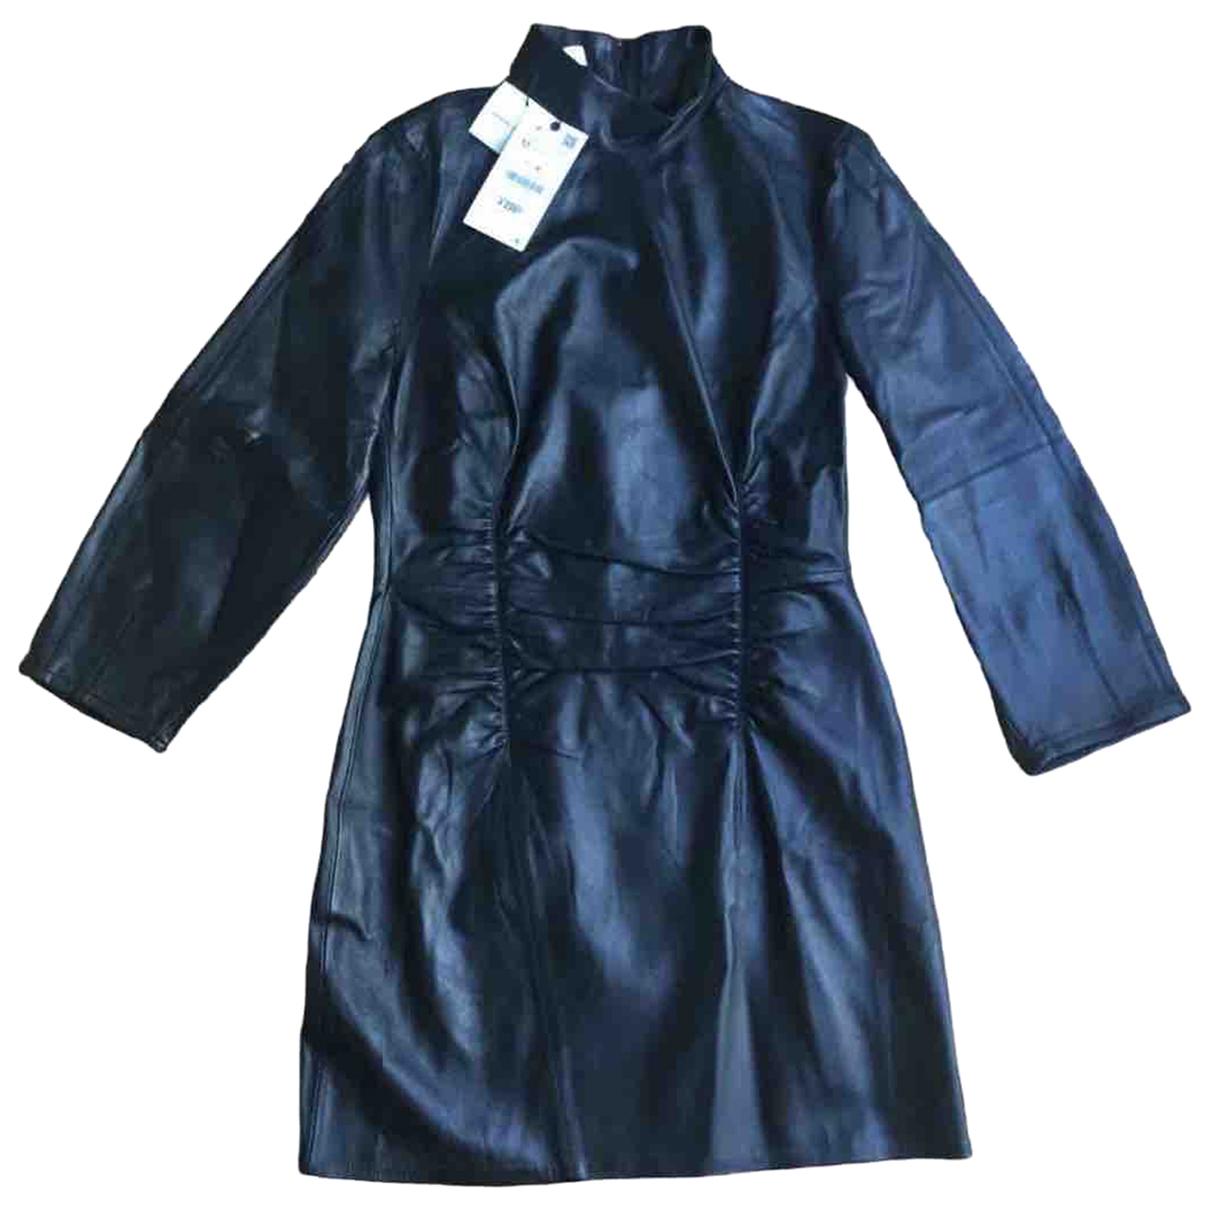 Zara - Robe   pour femme en cuir - noir